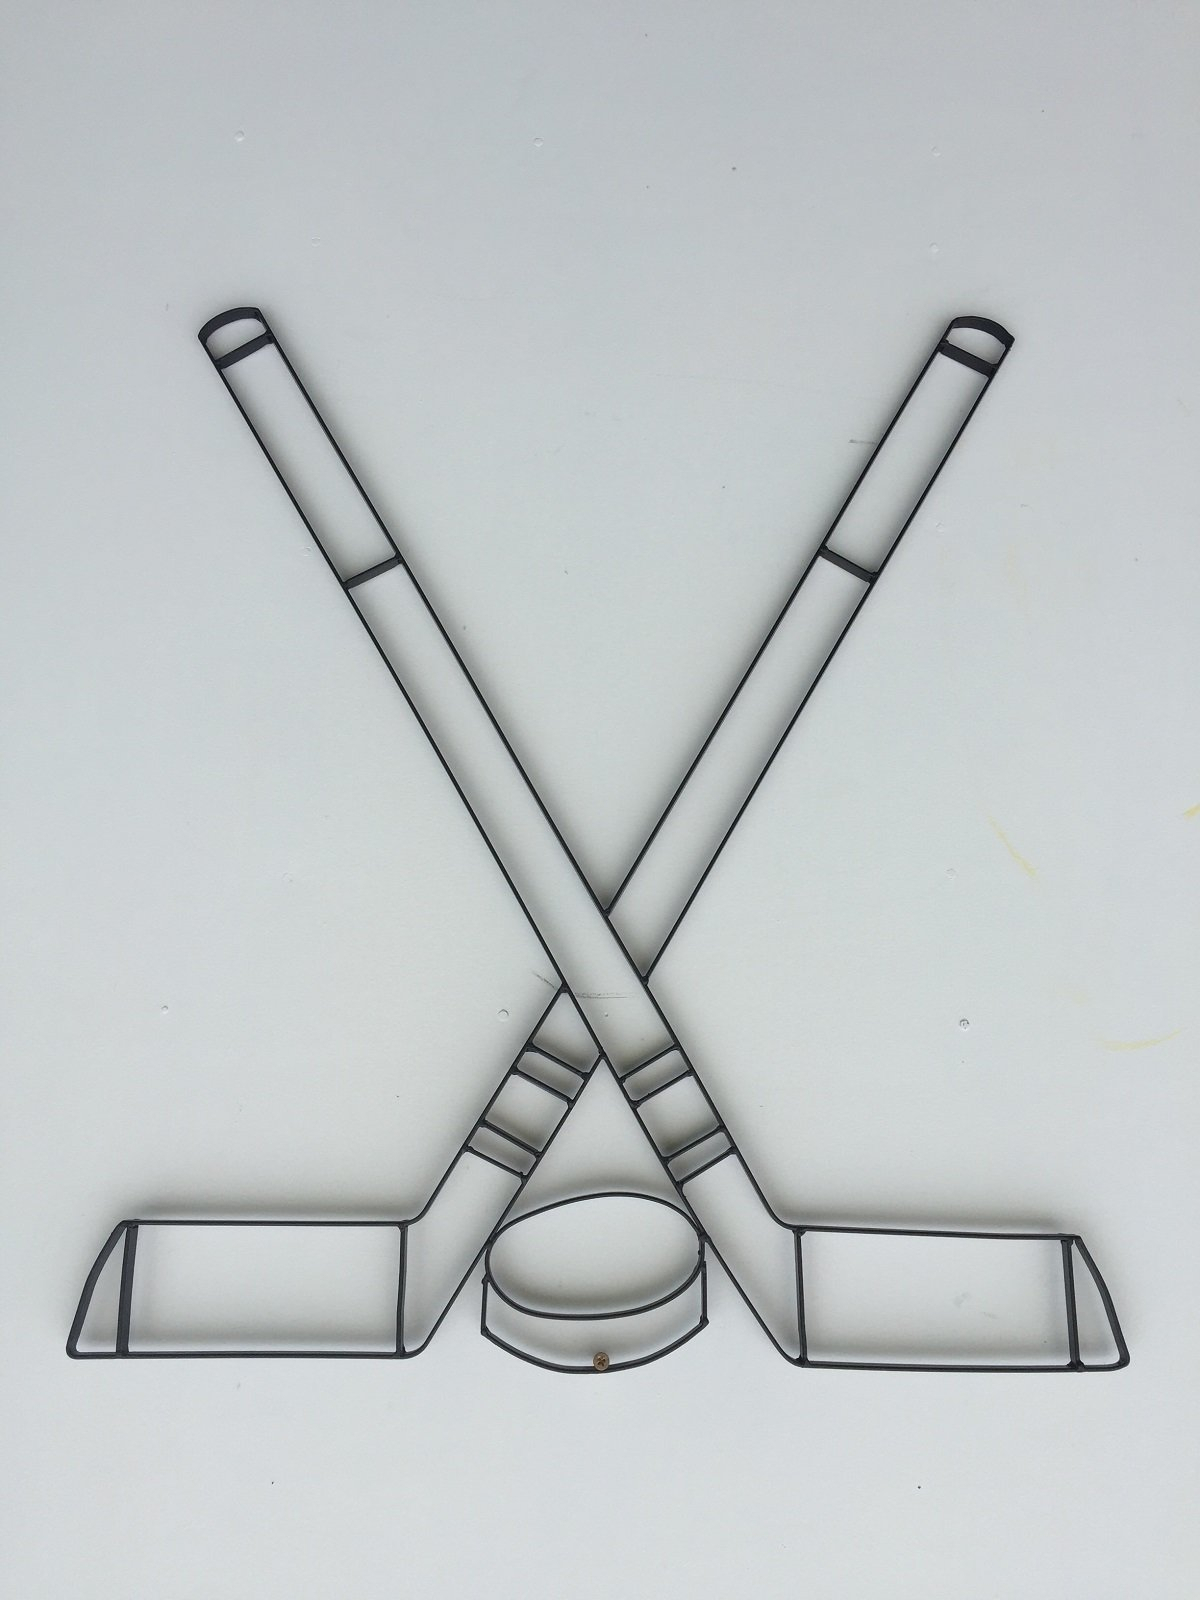 Hockey Wall Decor | Rikenik pertaining to Metal Wall Decor By Winston Porter (Image 13 of 30)